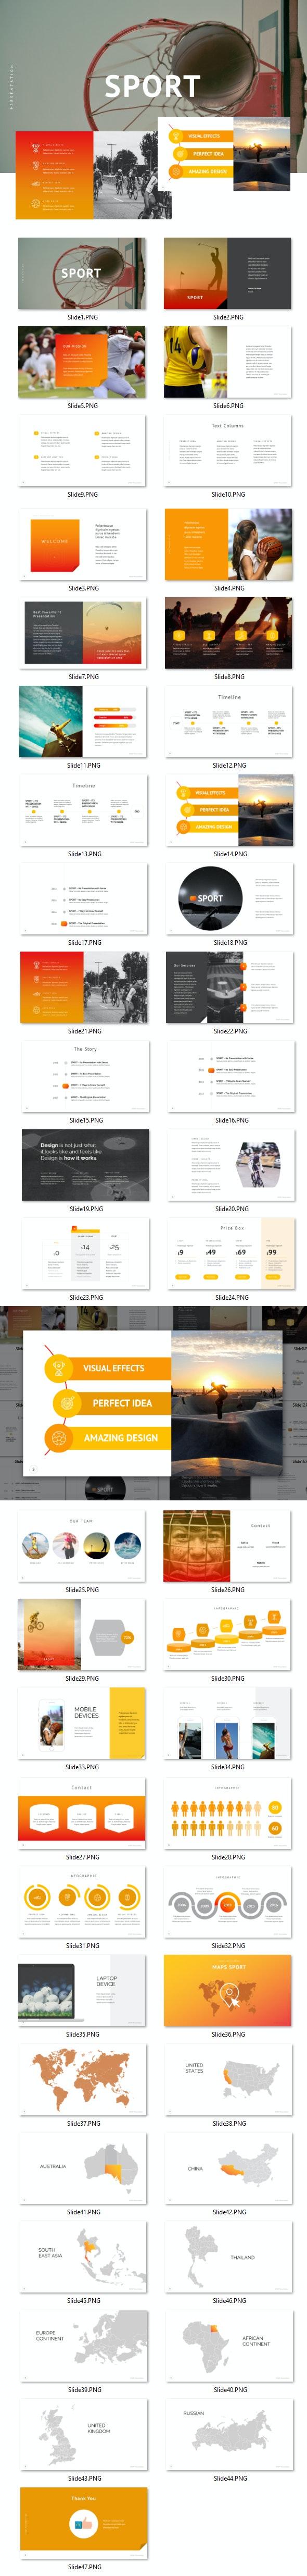 Sport - PowerPoint - PowerPoint Templates Presentation Templates